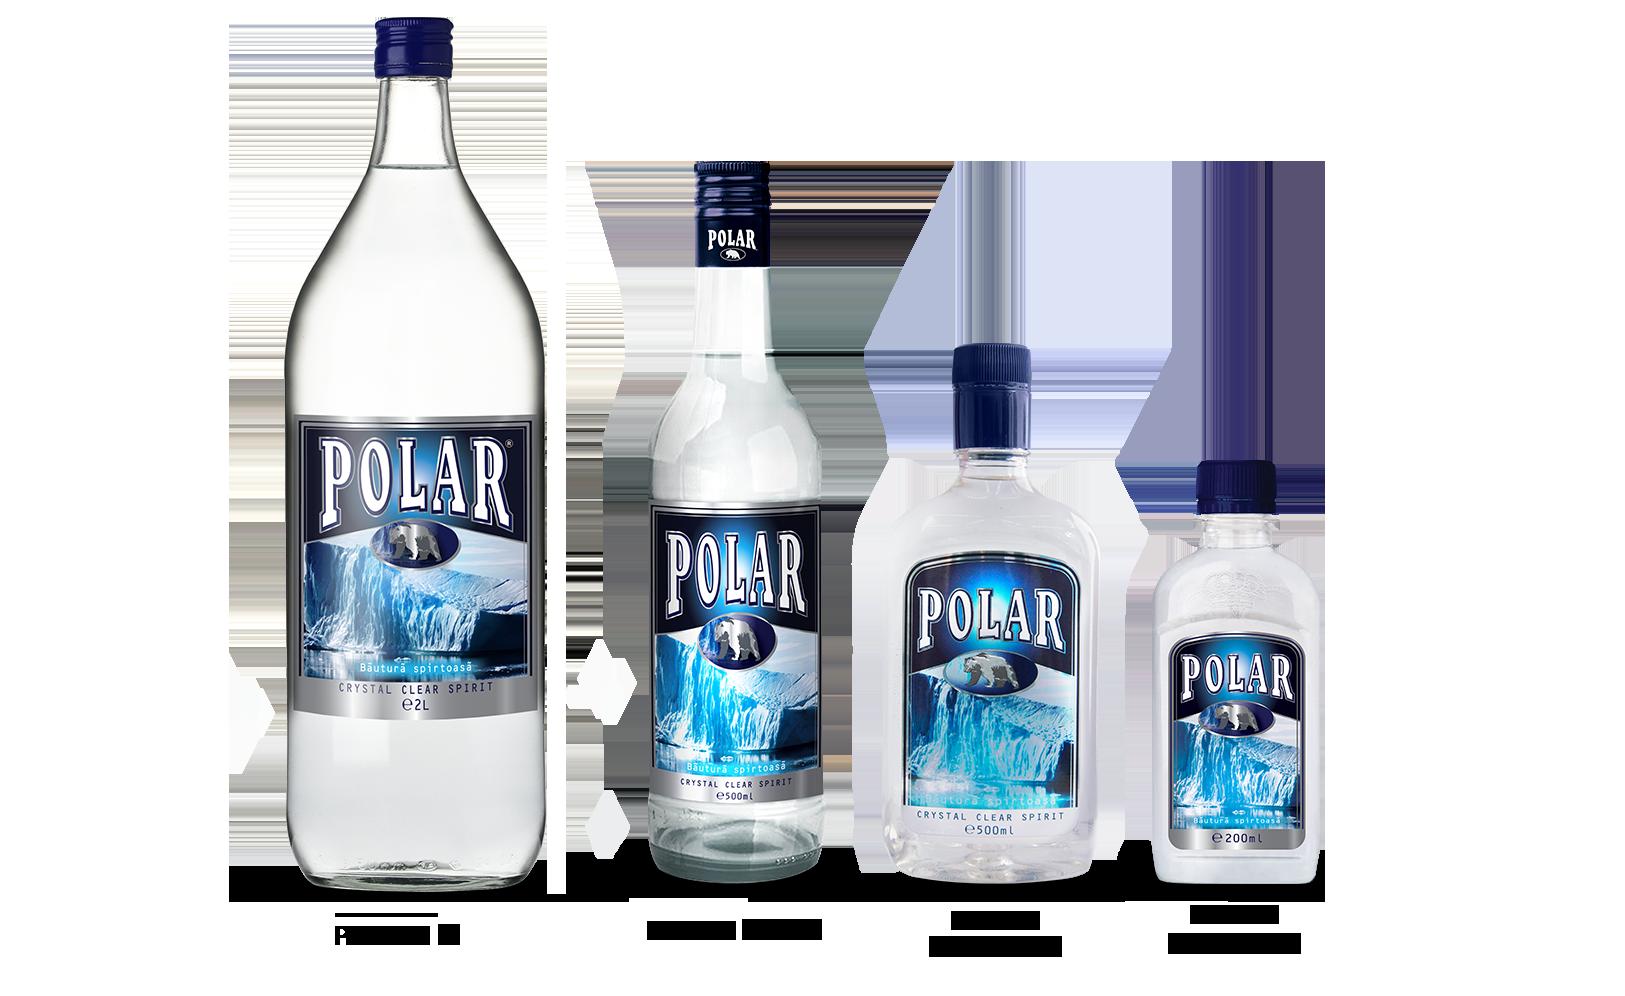 polar-poza2